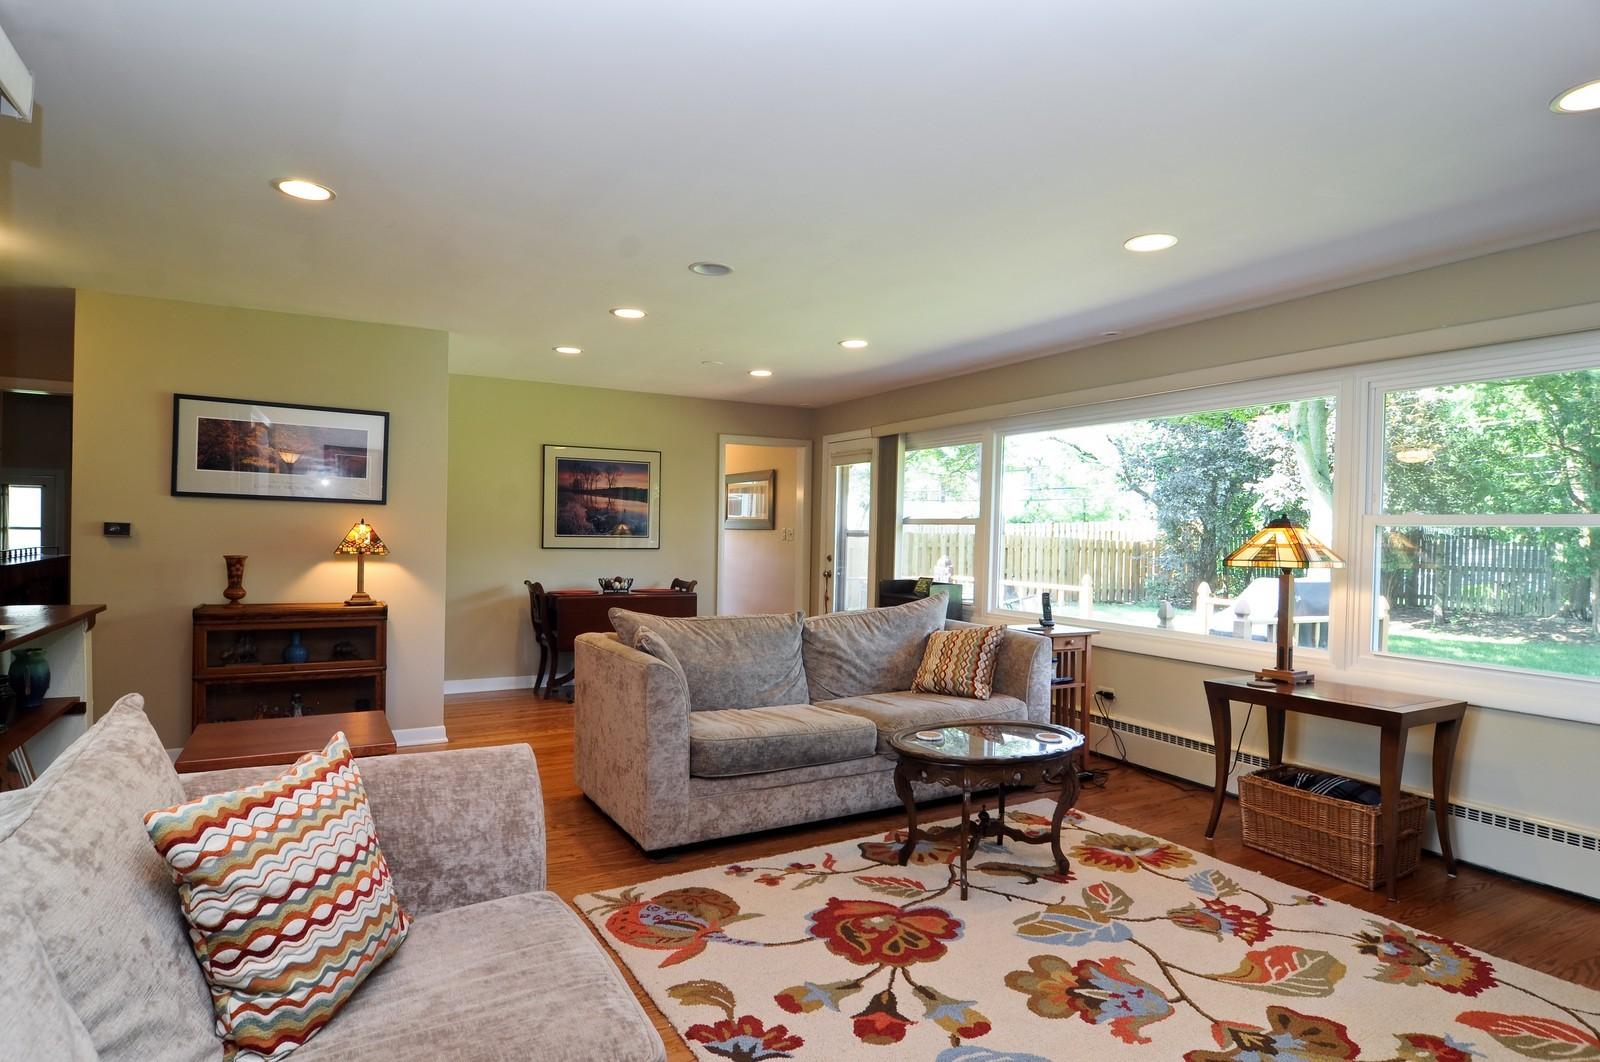 Real Estate Photography - 240 Sharon Dr, Barrington, IL, 60010 - Living Room